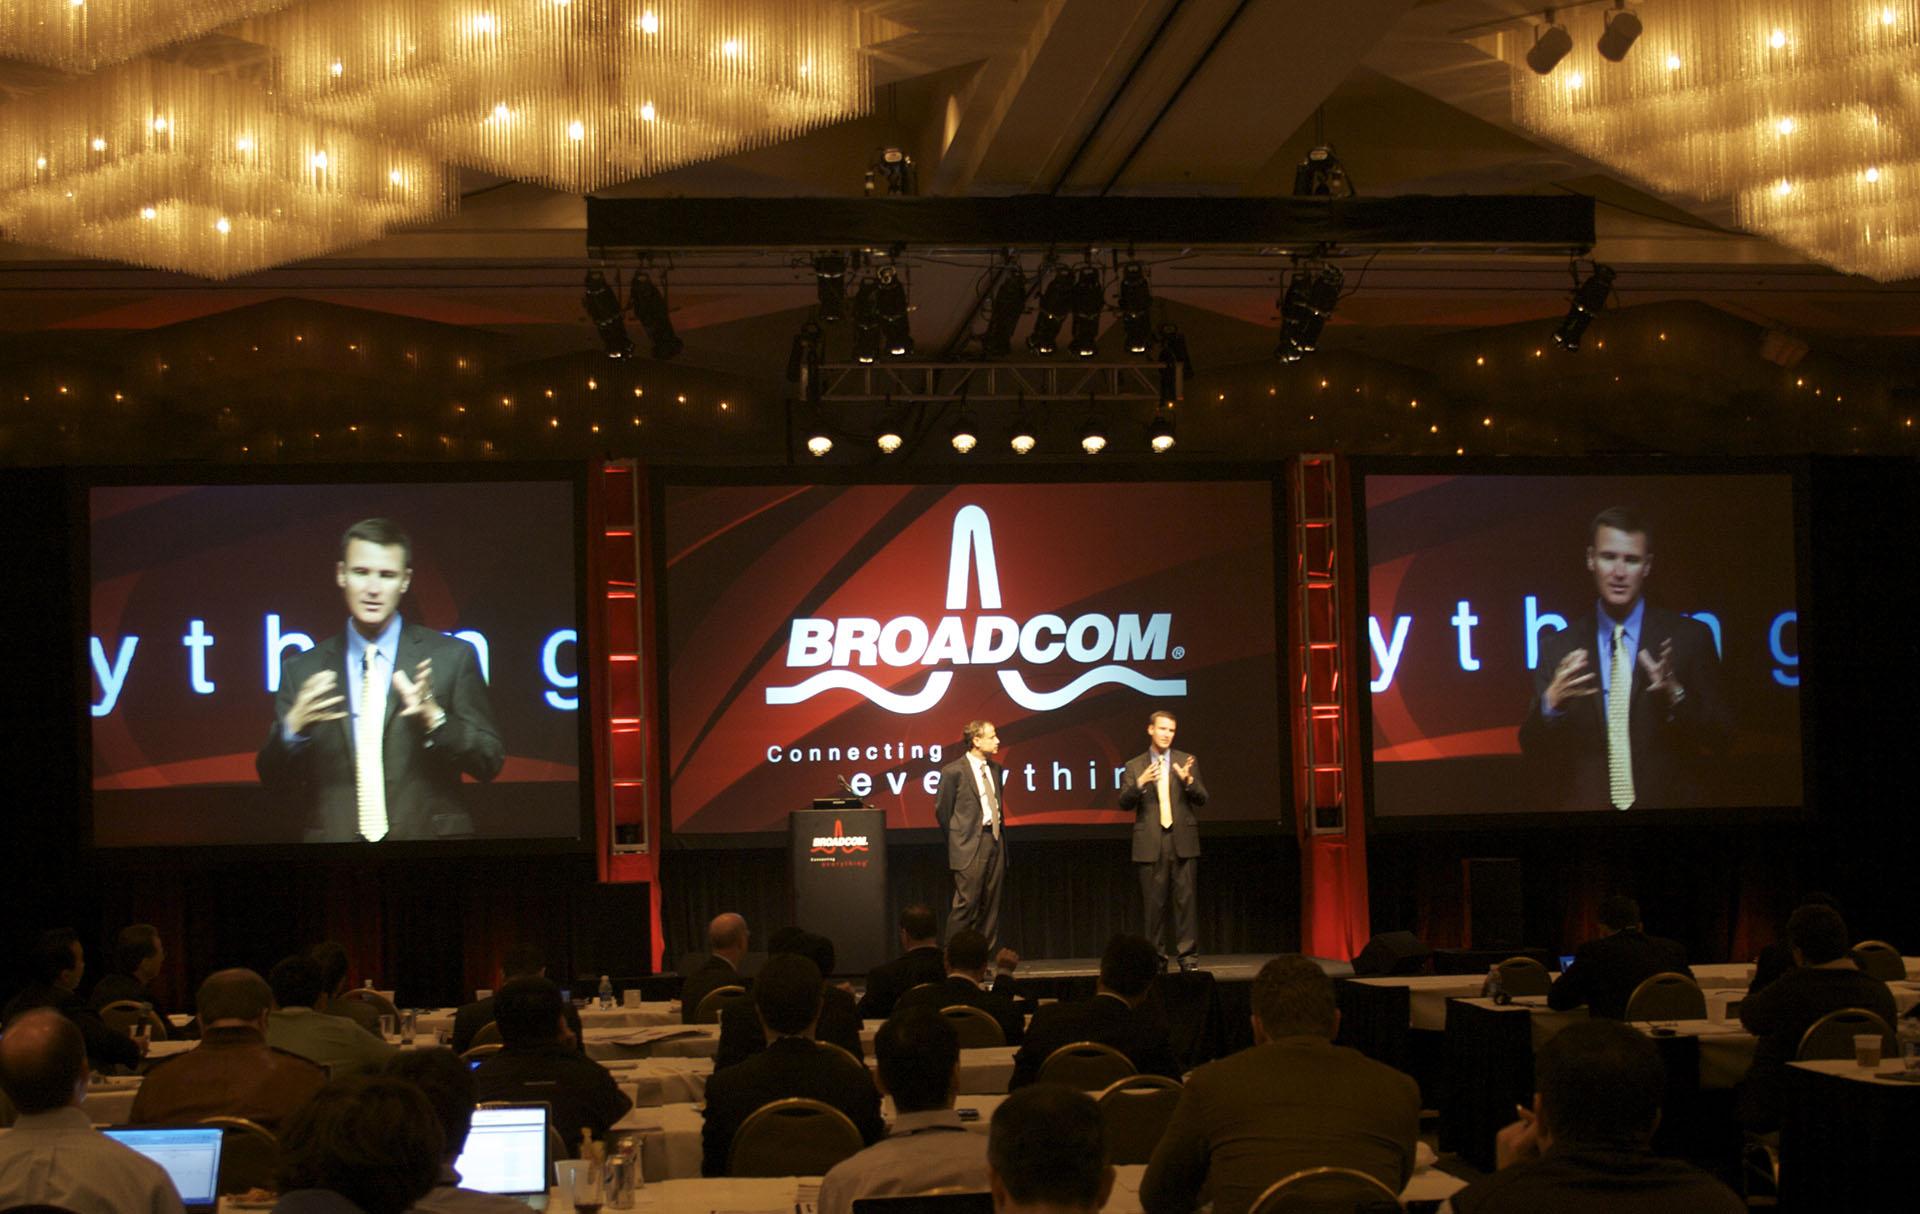 Broadcom Seminar